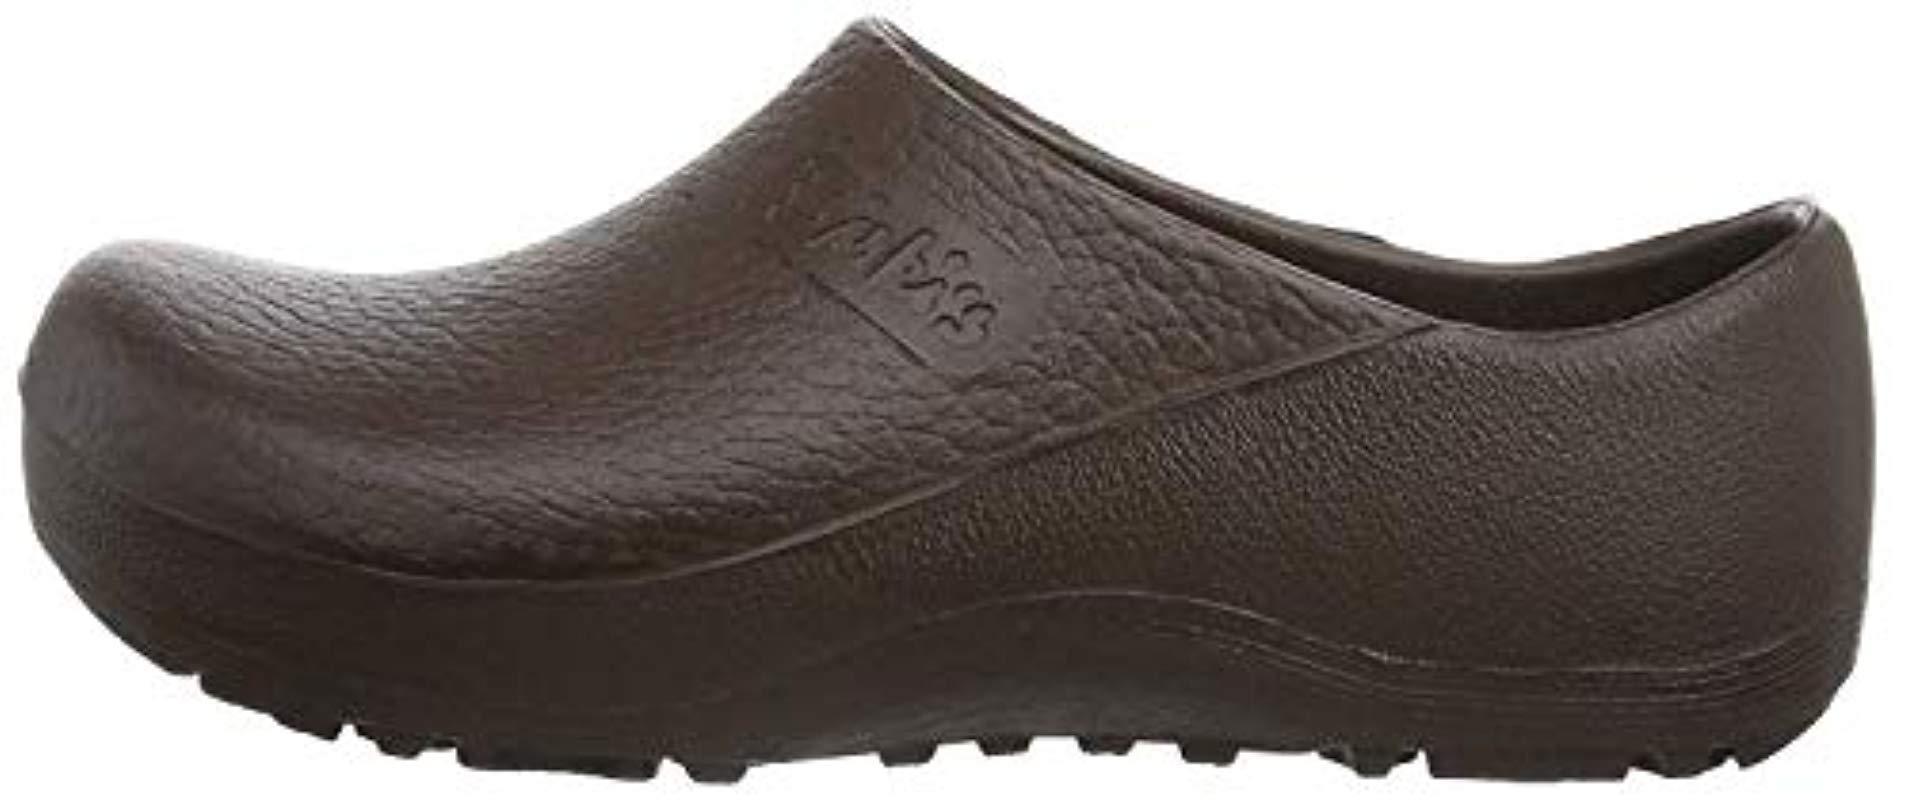 a89223c285ec2 Birkenstock Brown Professional Unisex Profi Birki Slip Resistant Work Shoe  for men